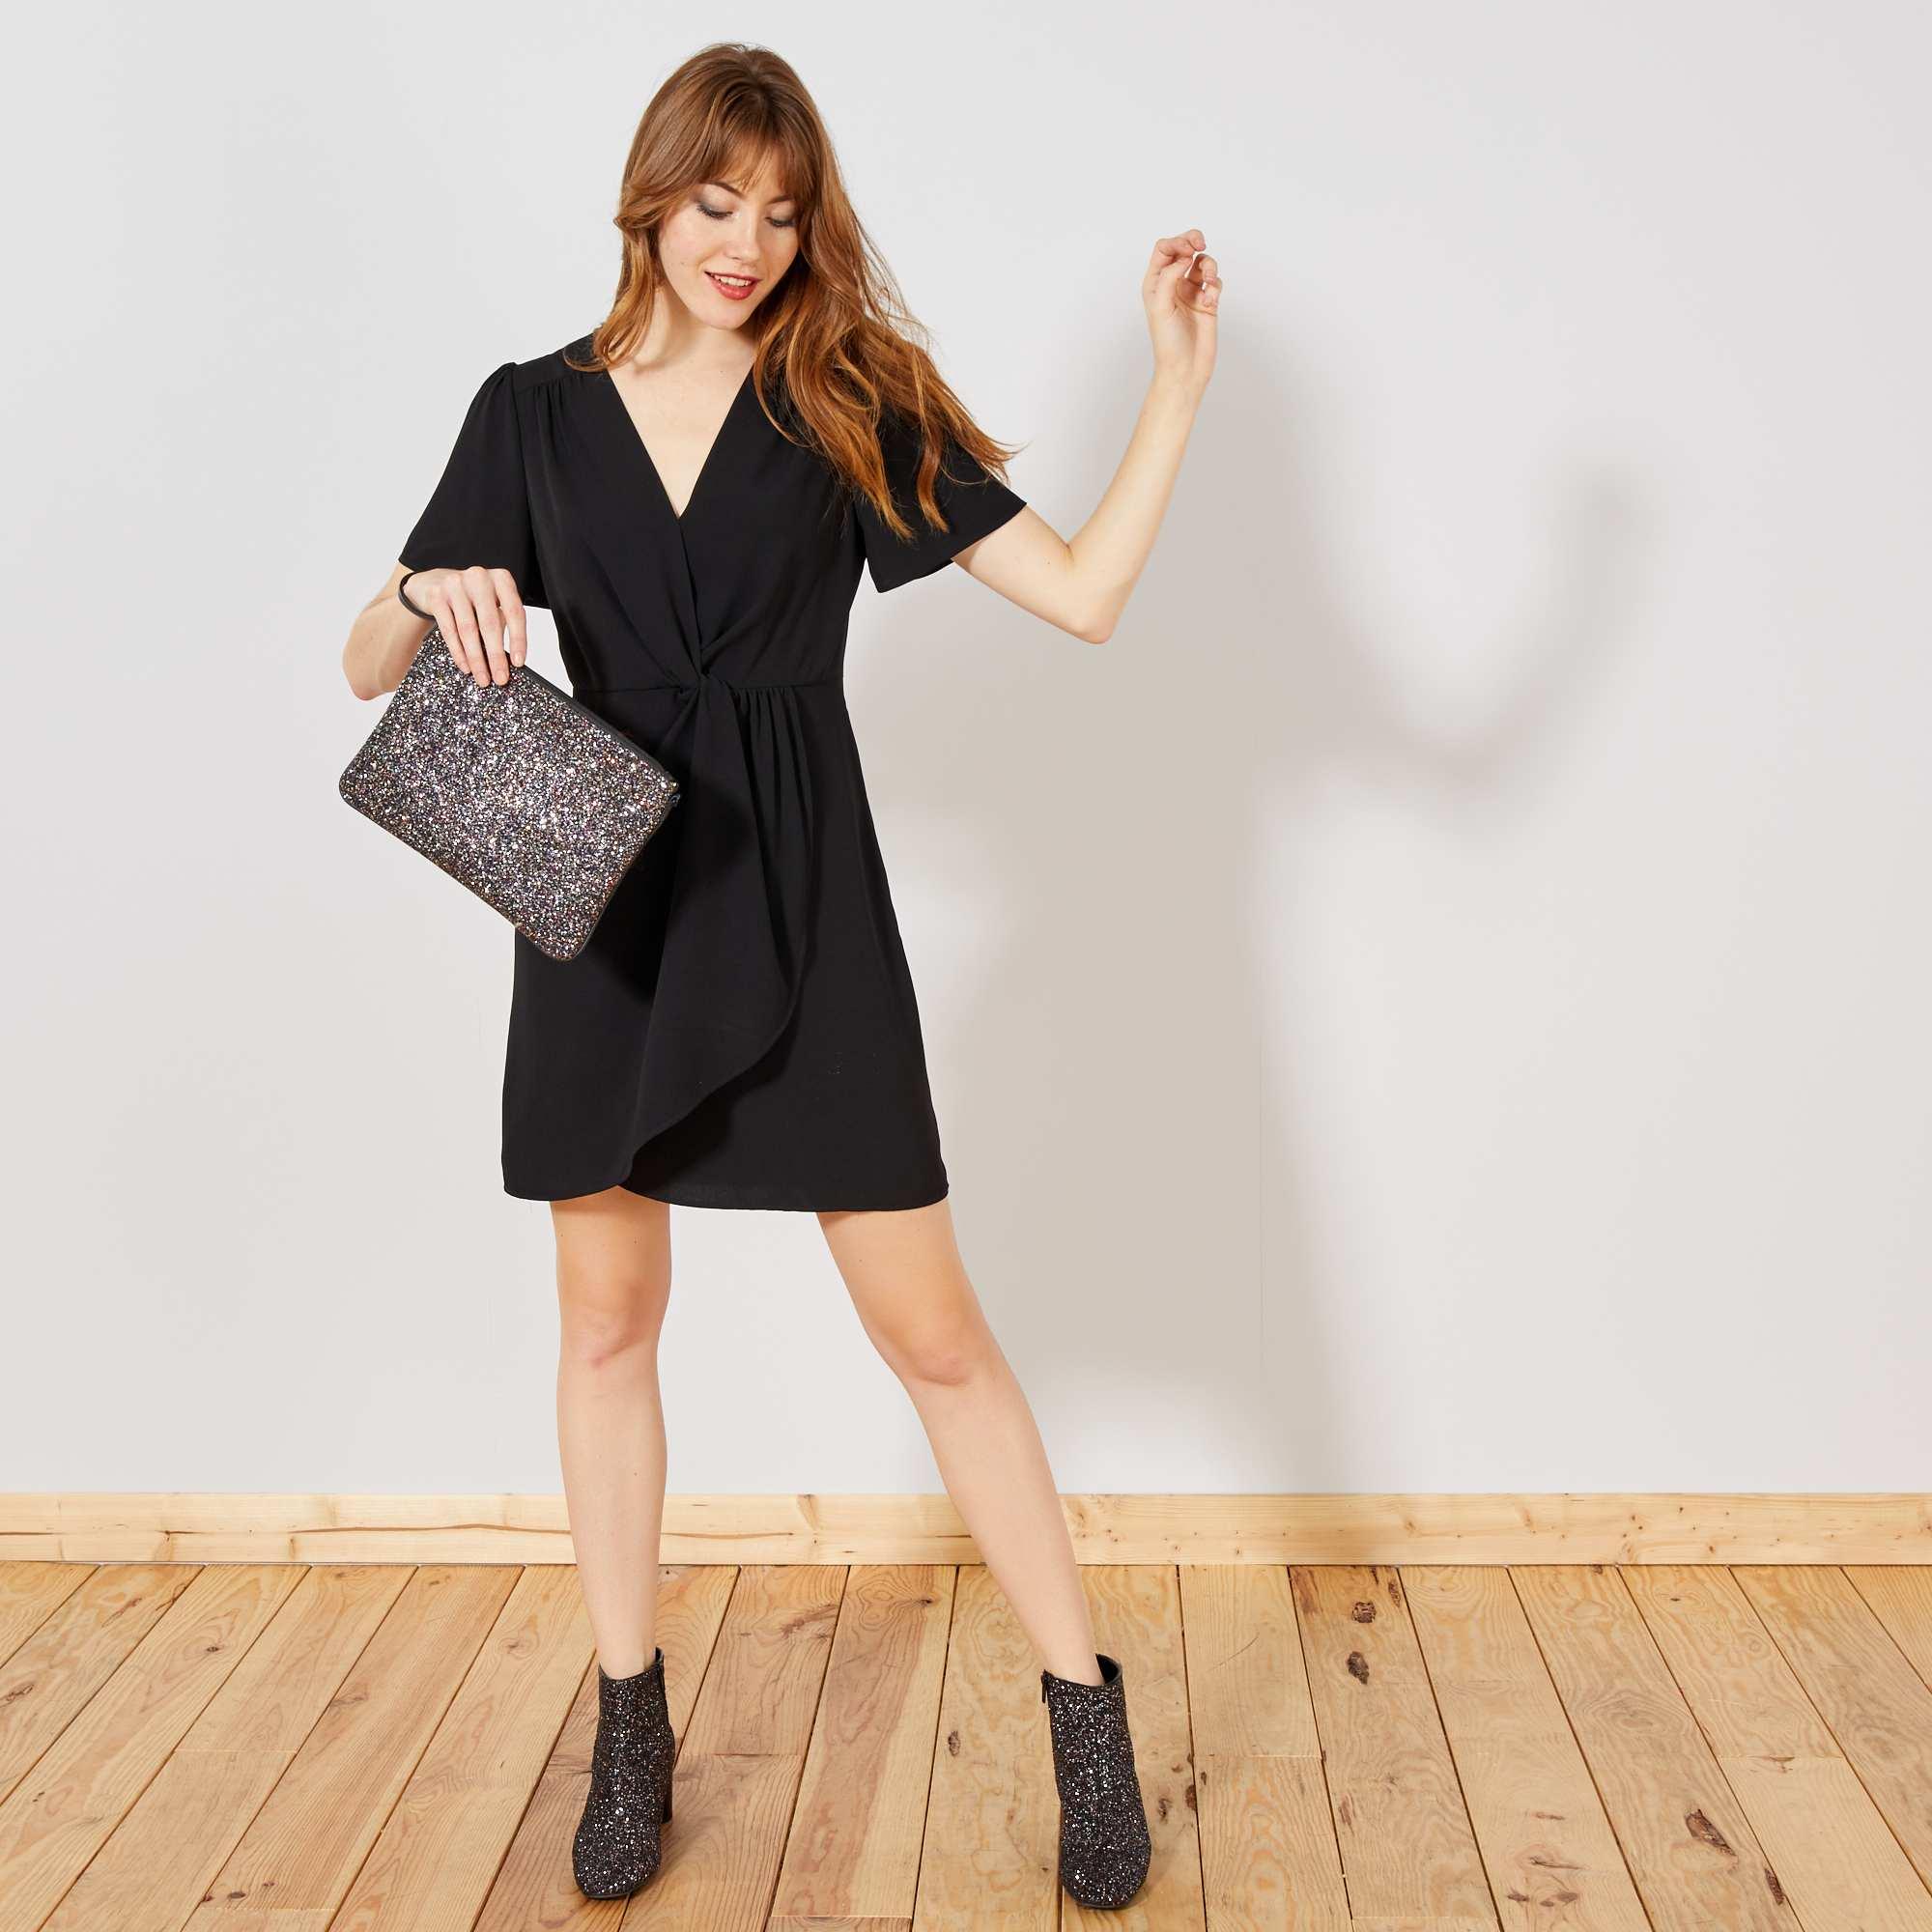 67d6eadfd68 Robe portefeuille fluide Femme - noir - Kiabi - 18